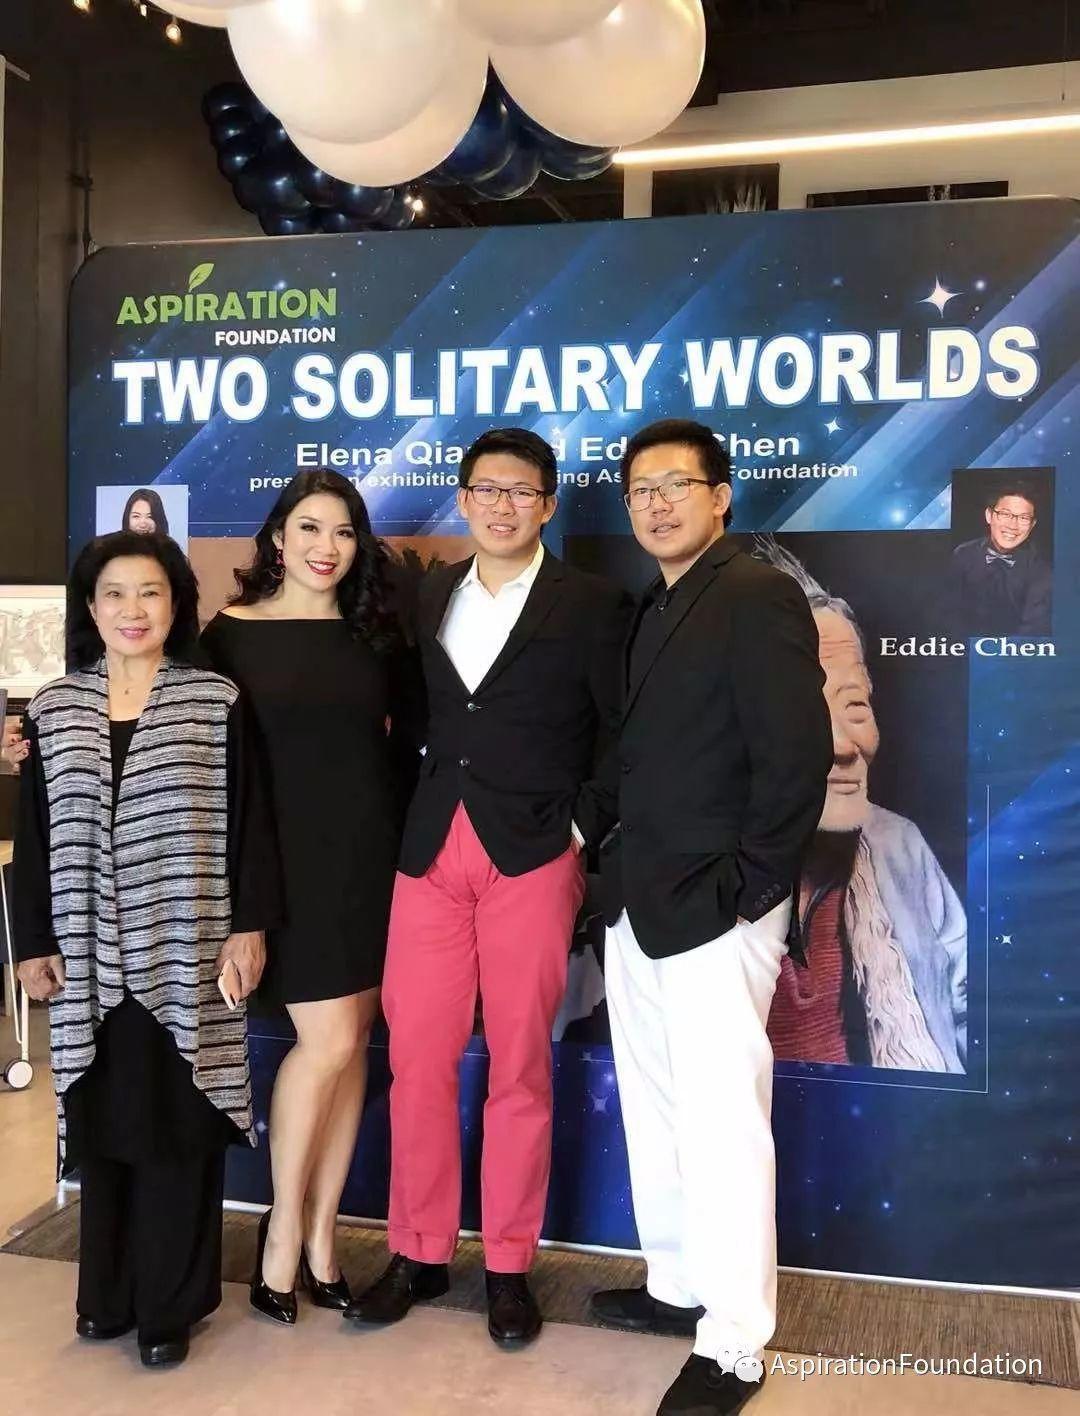 Two Solitary World —Elena Qian 和 Eddie Chen 举办联合画展资助希望之源基金会